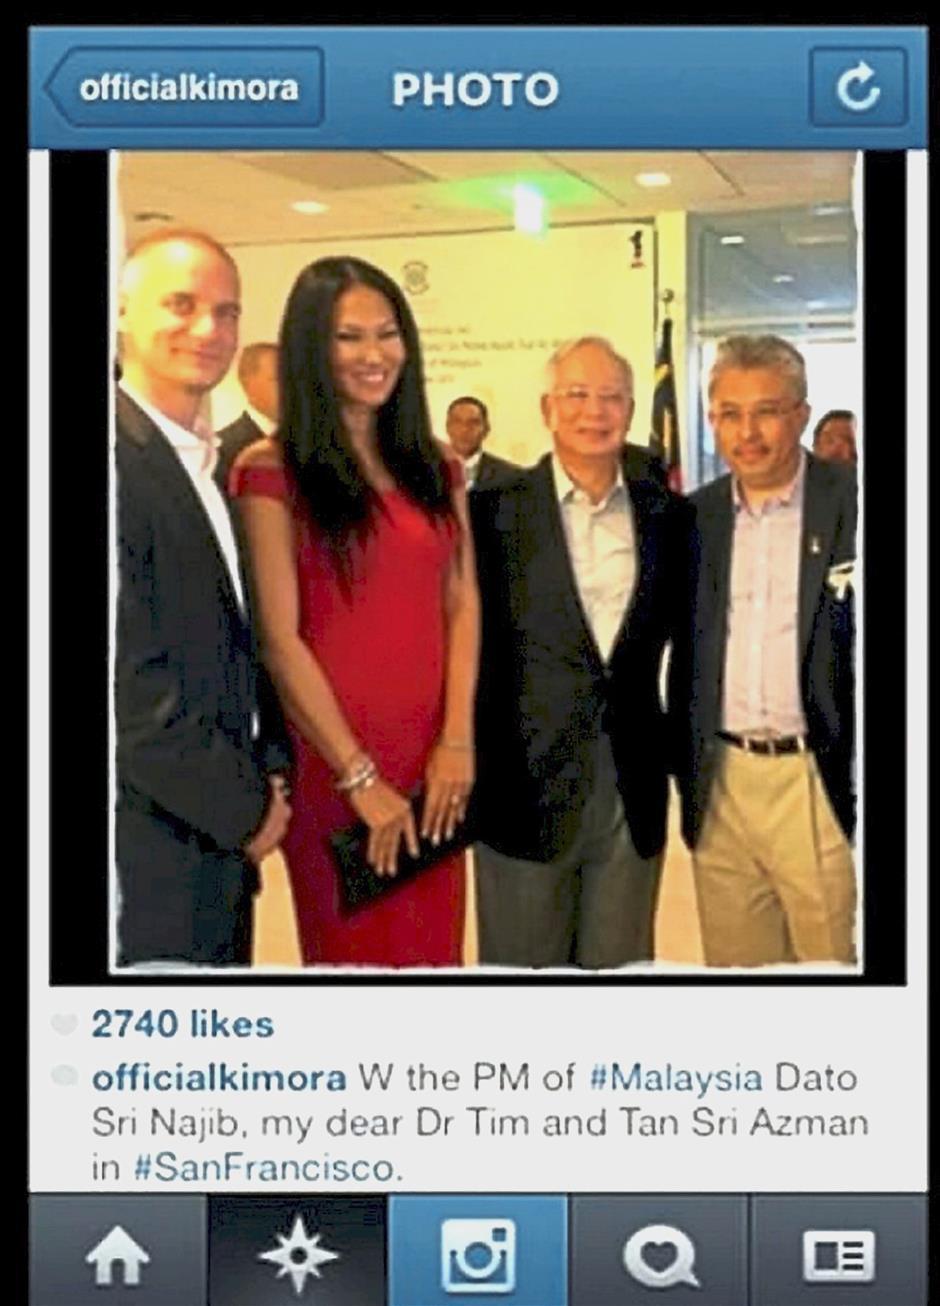 Famous company: A screenshot taken from Leissner's designer wife Kimora Lee's Instagram account showing (from left) Leissner, Kimora, former prime minister Datuk Seri Najib Tun Razak and Khazanah managing director Tan Sri Azman Mokhtar in 2013.